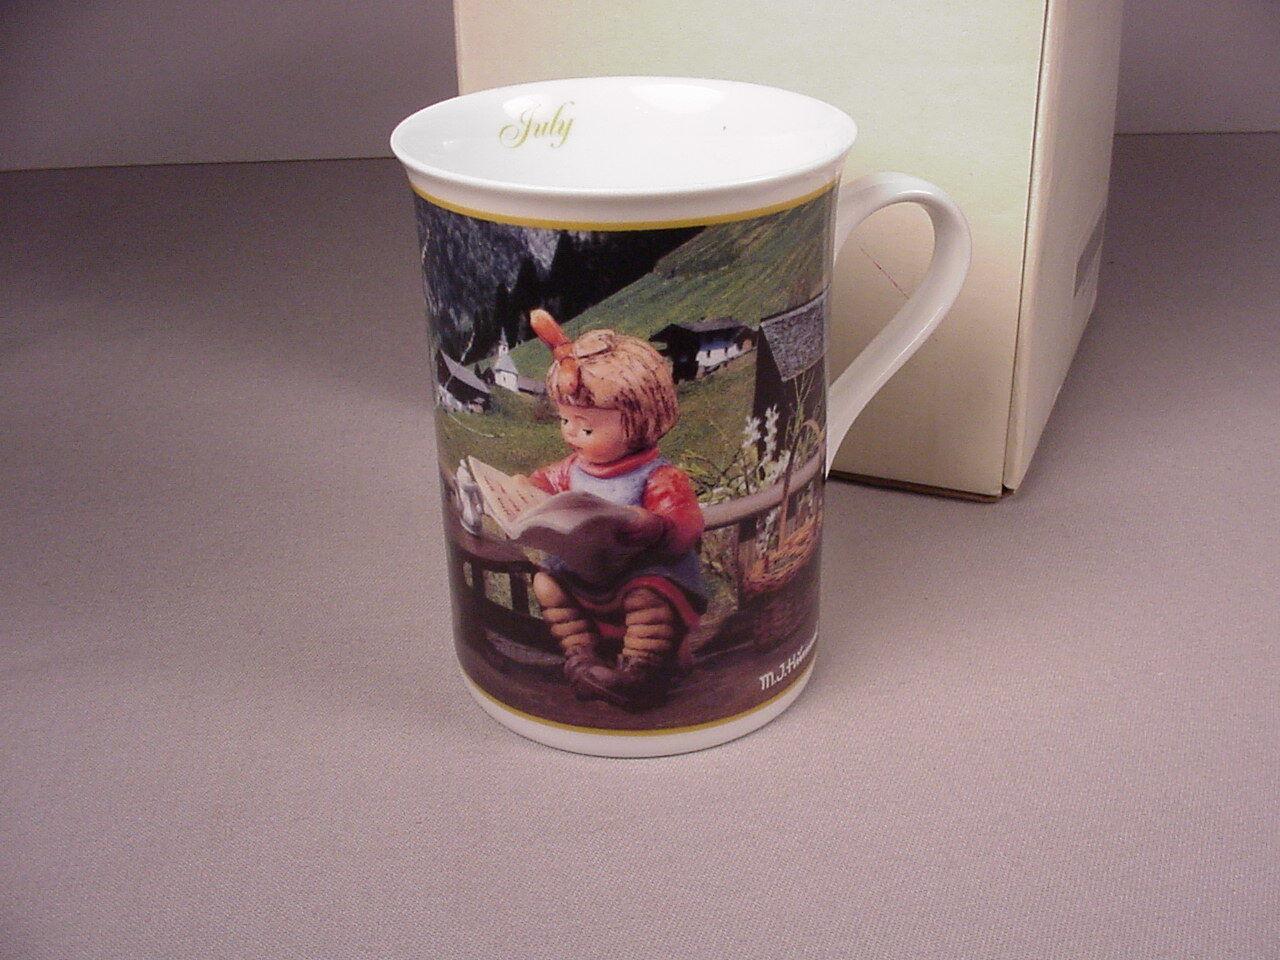 Decorative collectibles m i hummel fine porcelain mug july whats new mib danbury mint new in box reviewsmspy